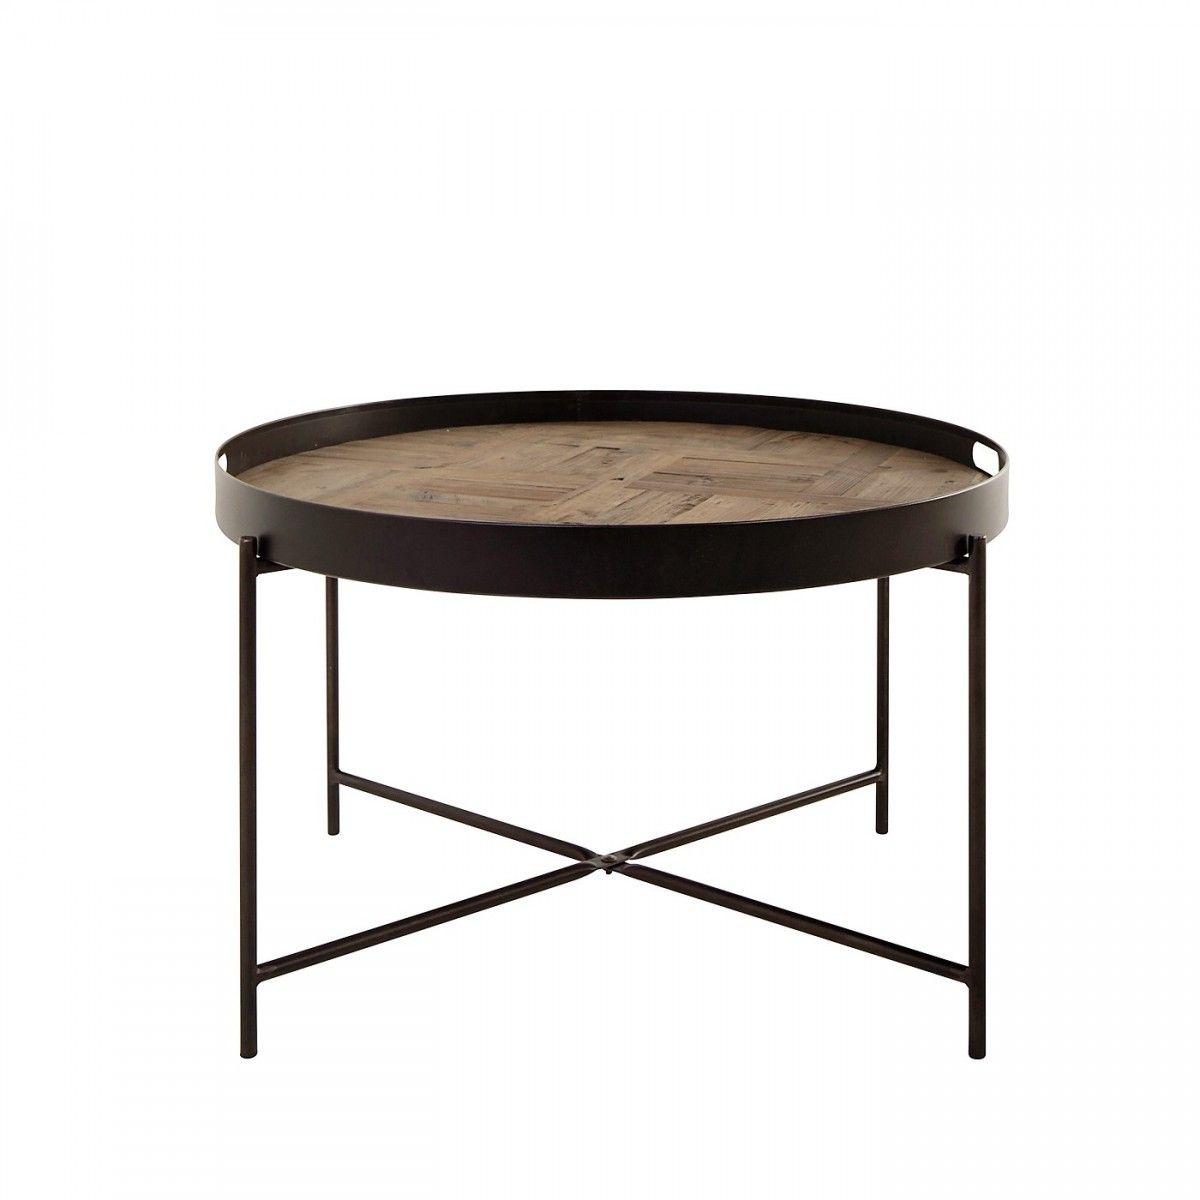 Table Basse Ronde Pin Et Metal 80 Cm Barrio Avec Images Table